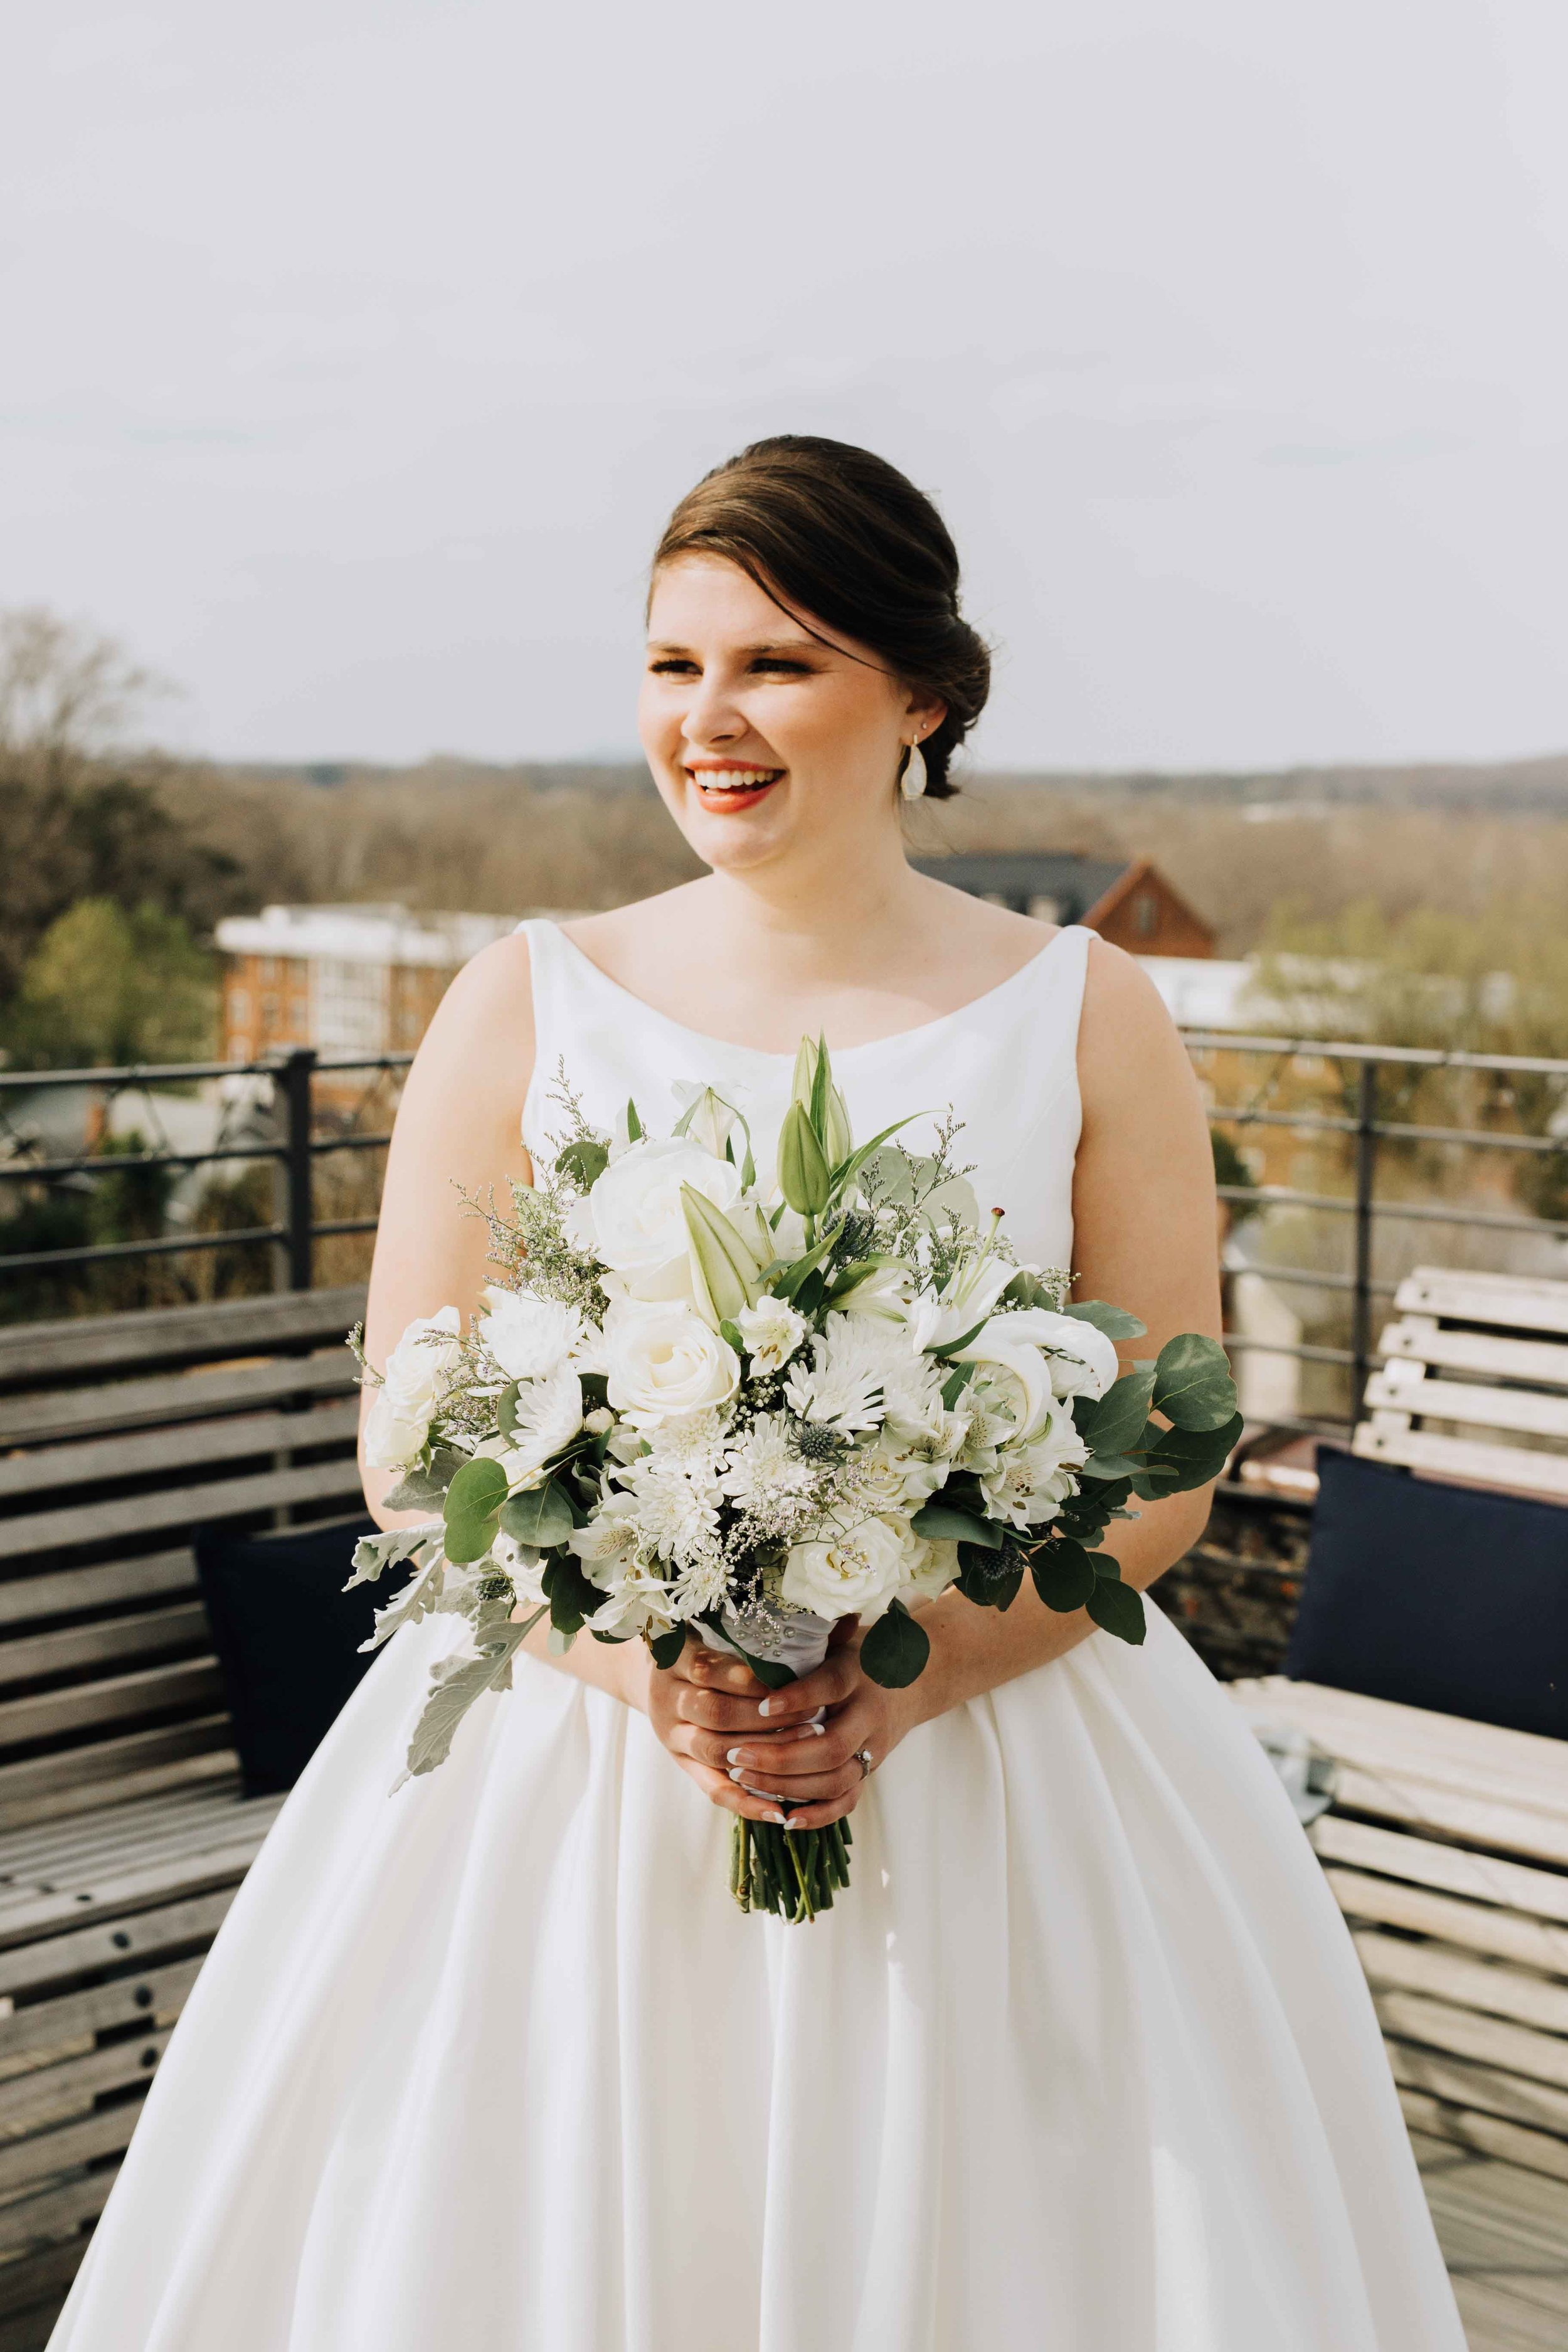 Farmville-Virginia-Wedding-Hotel-Weynoke-Downtown-Jacqueline-Waters-Photography-Detailed- (357).jpg